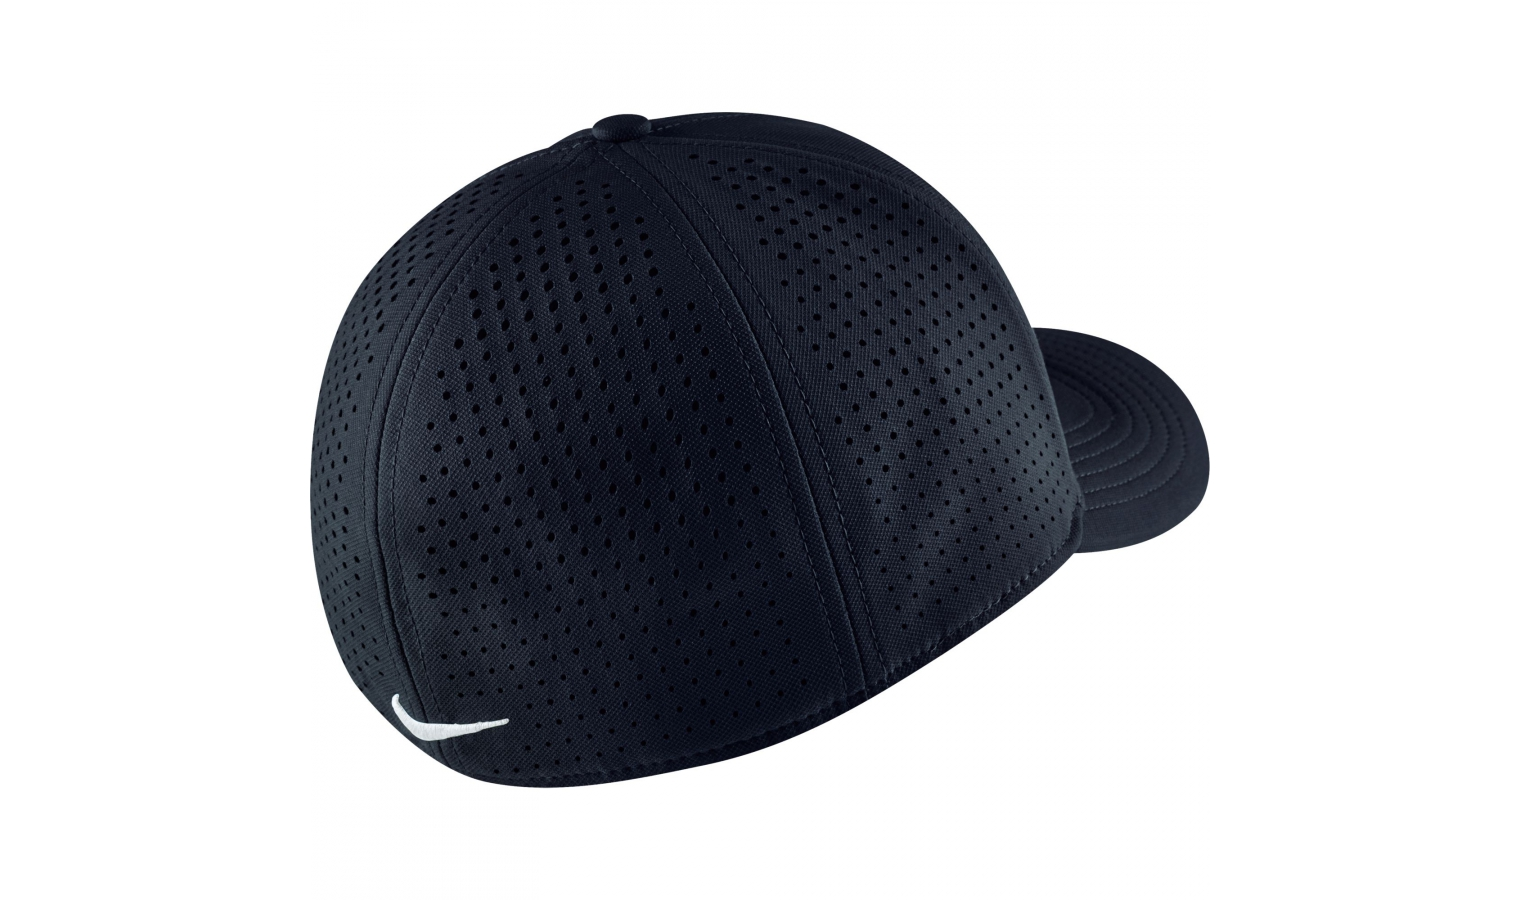 Pánská kšiltovka Nike CLC99 CAP TRAIN VAPOR SF černá  84024c24cd